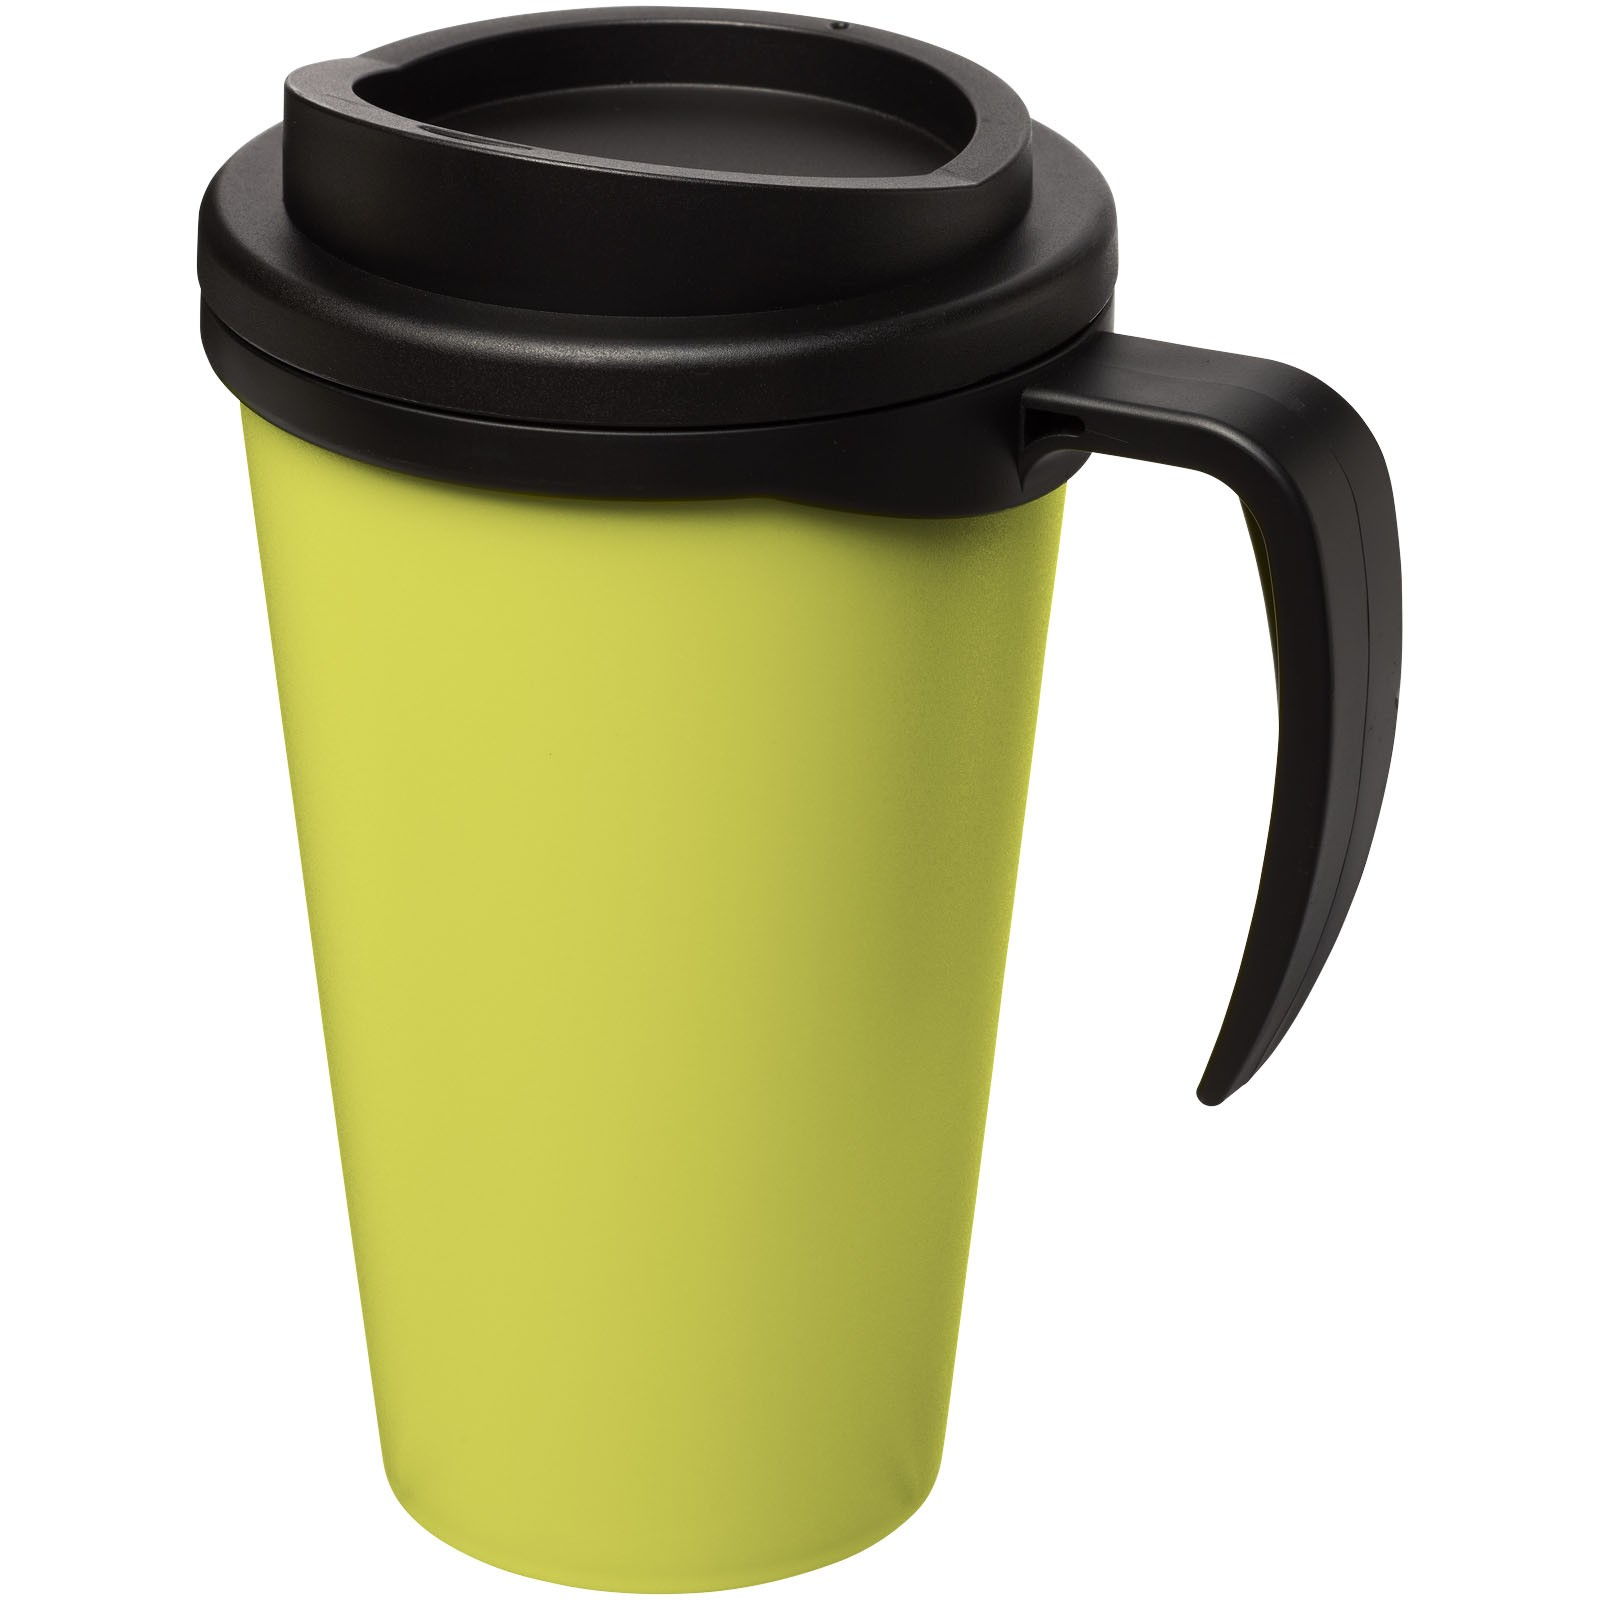 Americano® Vaso térmico grande de 350 ml - Lima / Negro intenso